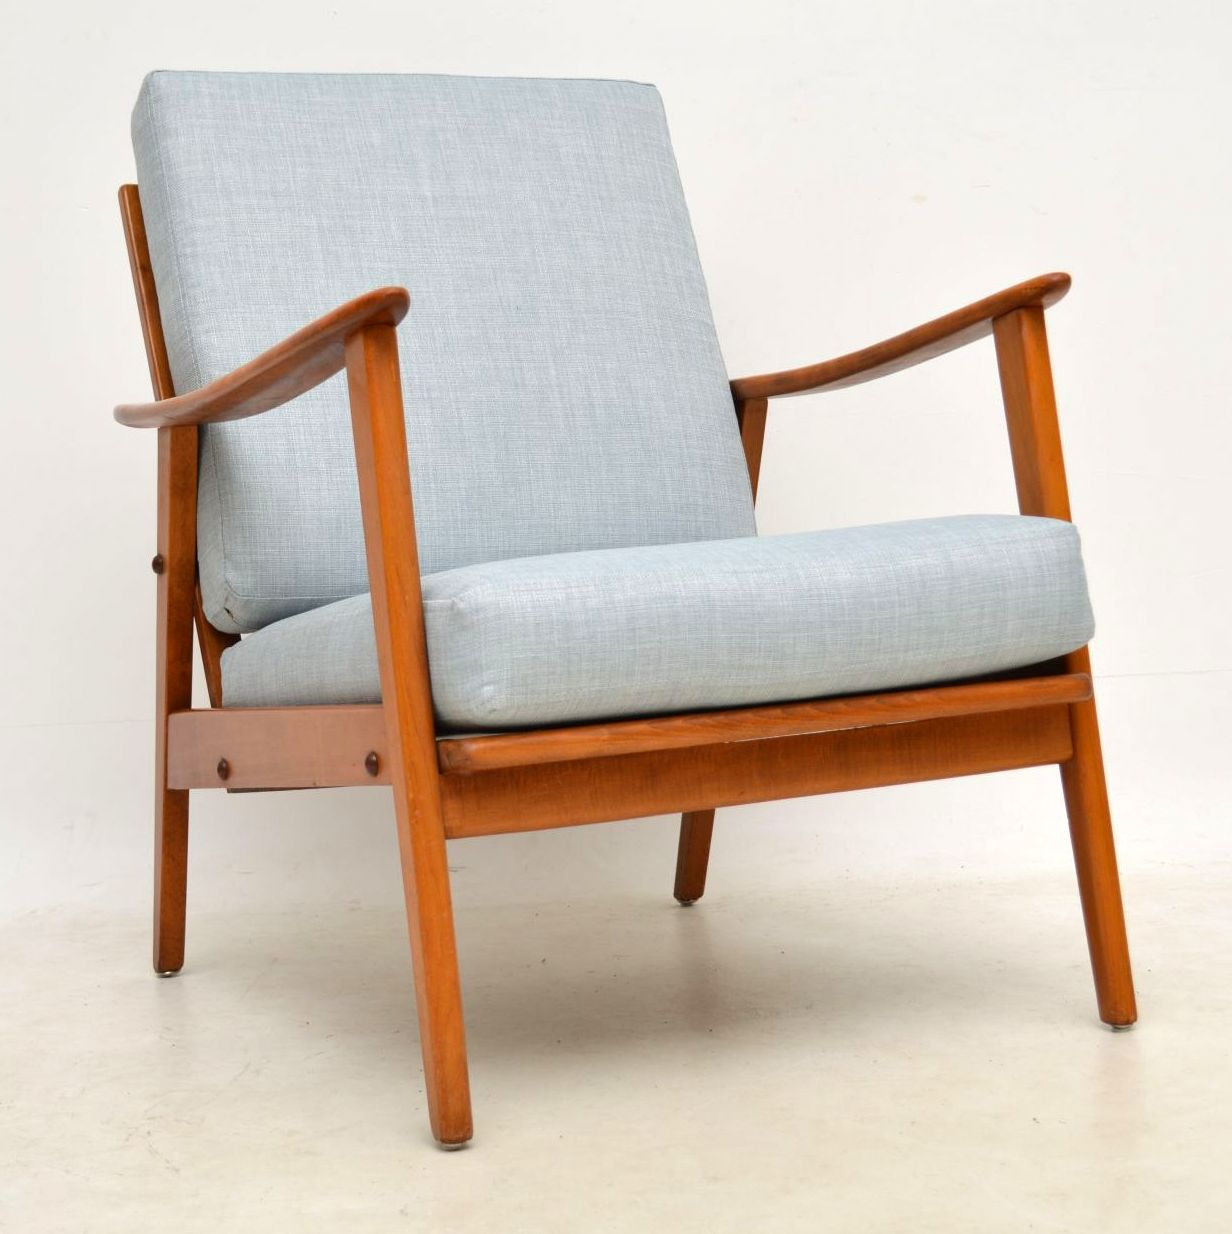 1960s Danish Vintage Armchair Retrospective Interiors